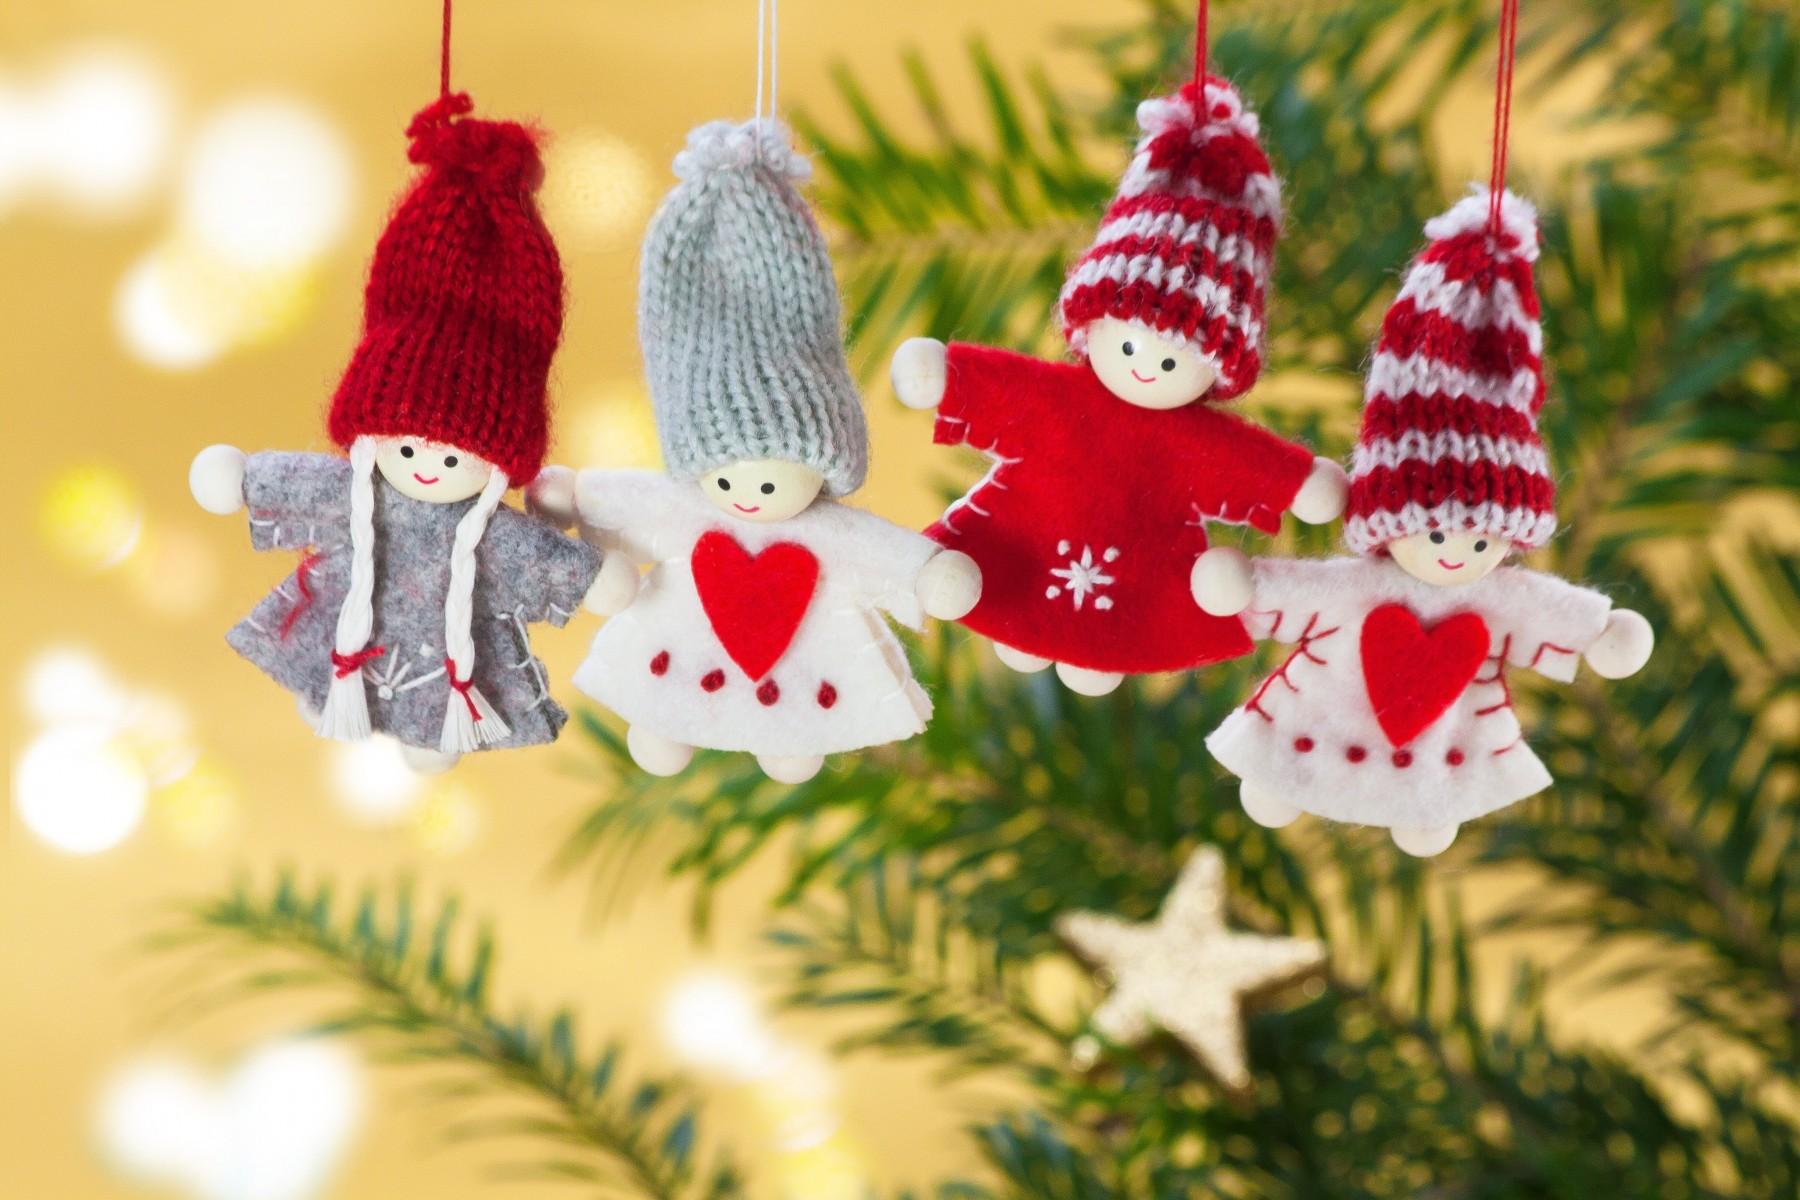 weihnachtsbaumschmuck weihnachtsbaumschmuck